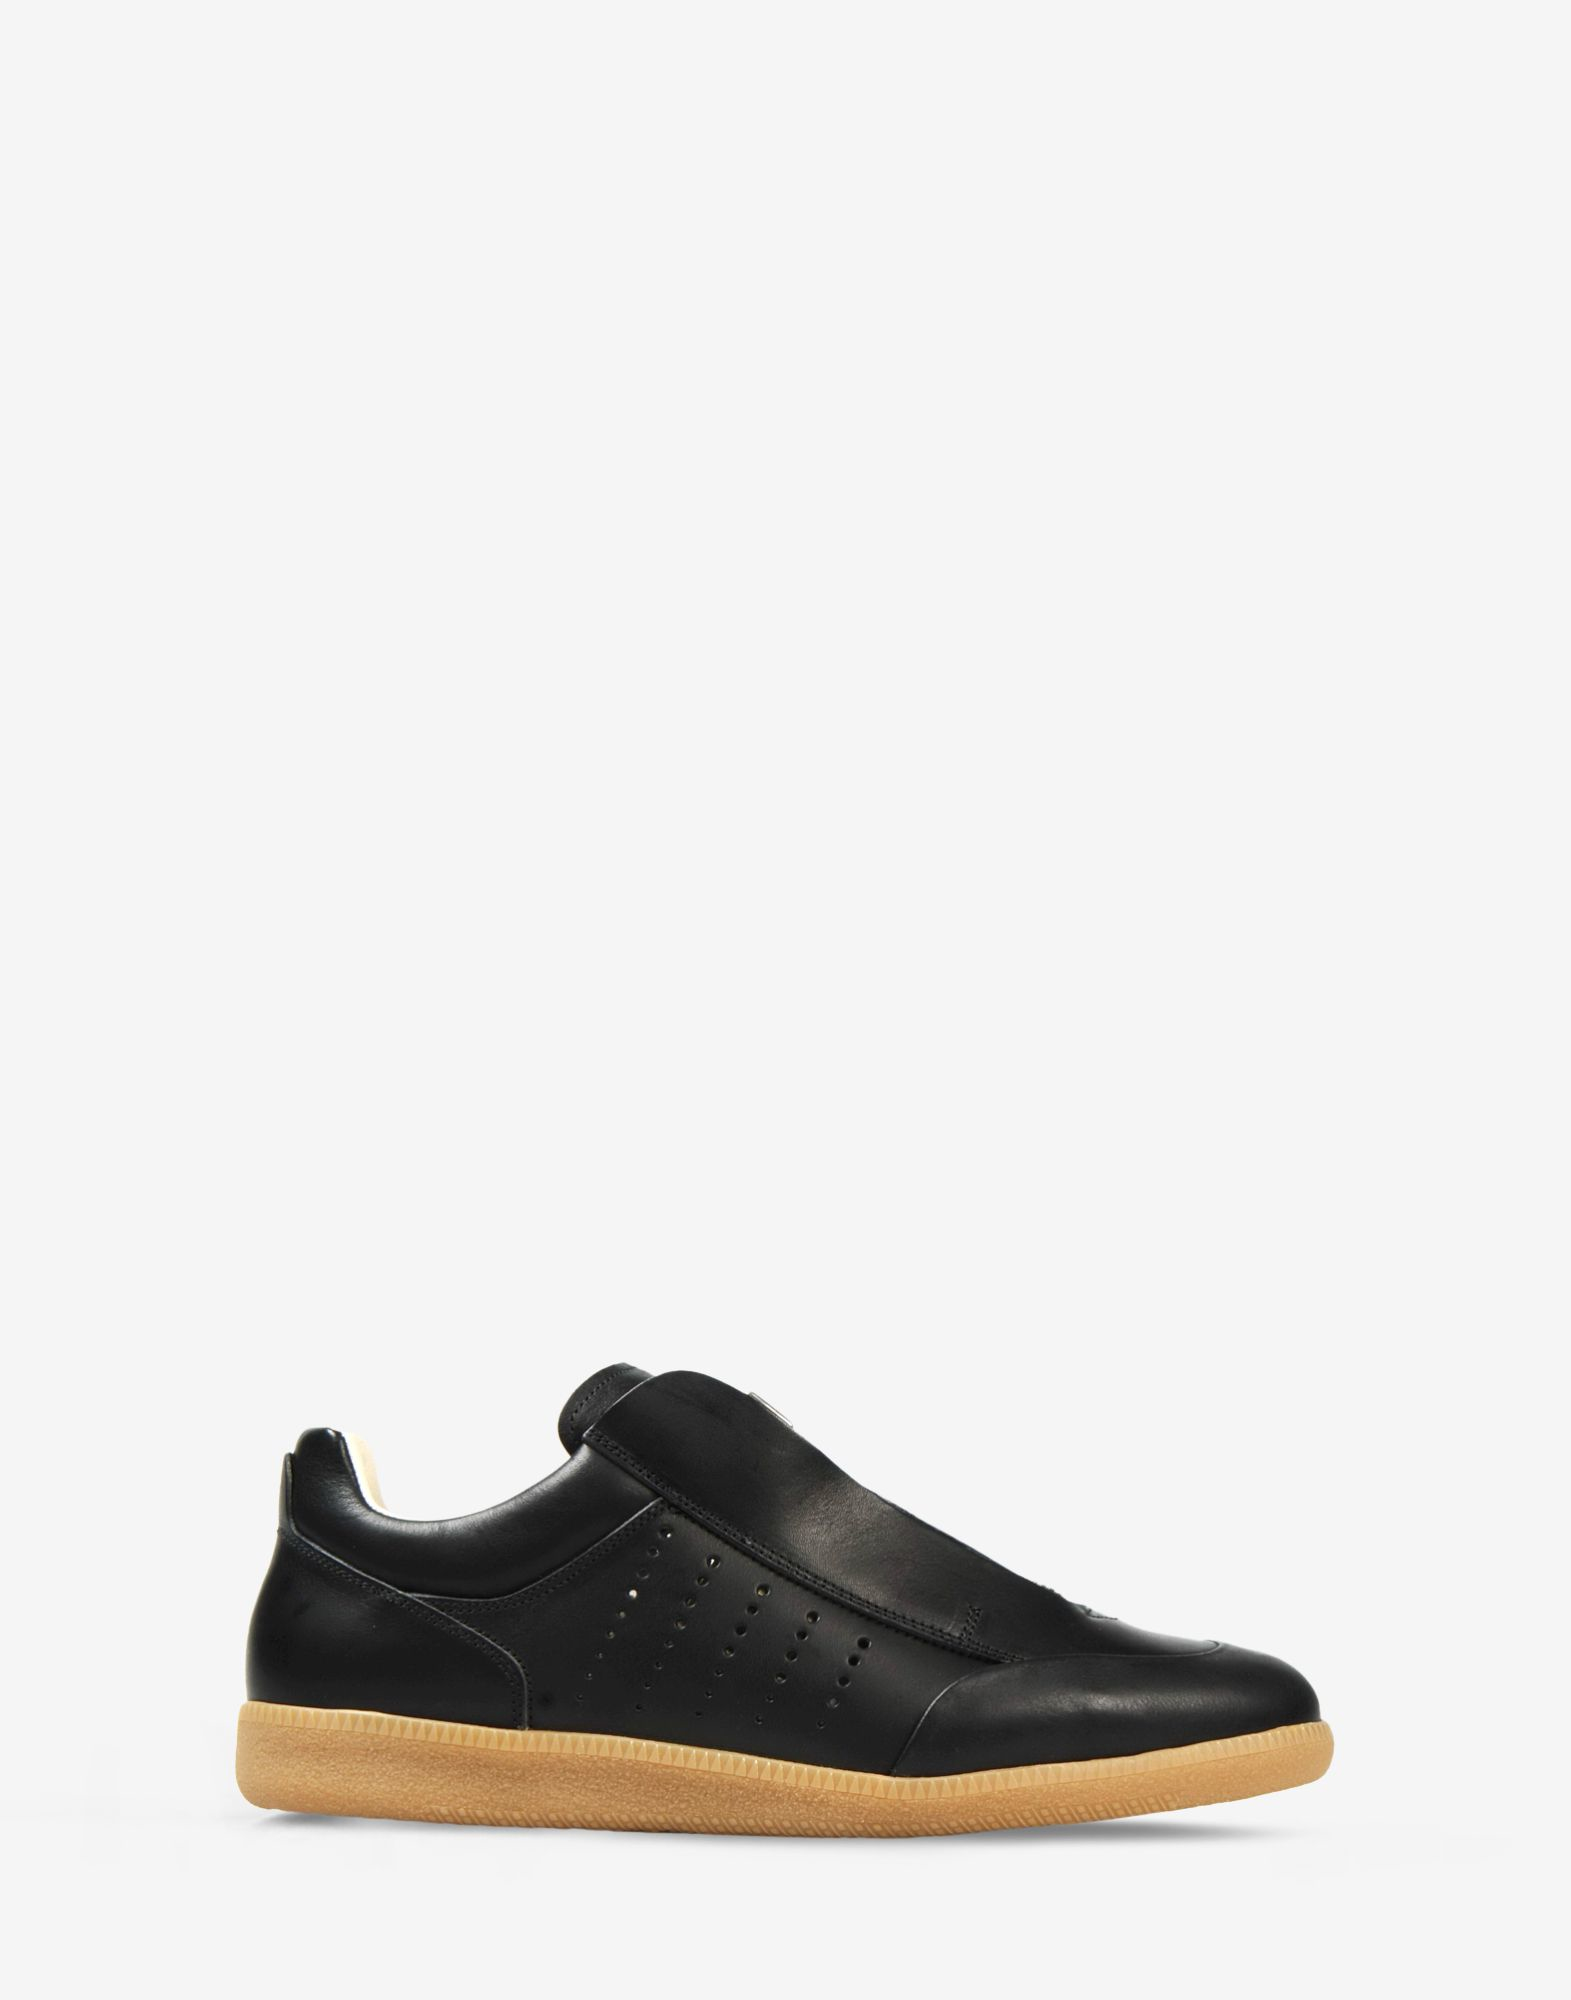 maison margiela sneakers in black for men lyst. Black Bedroom Furniture Sets. Home Design Ideas